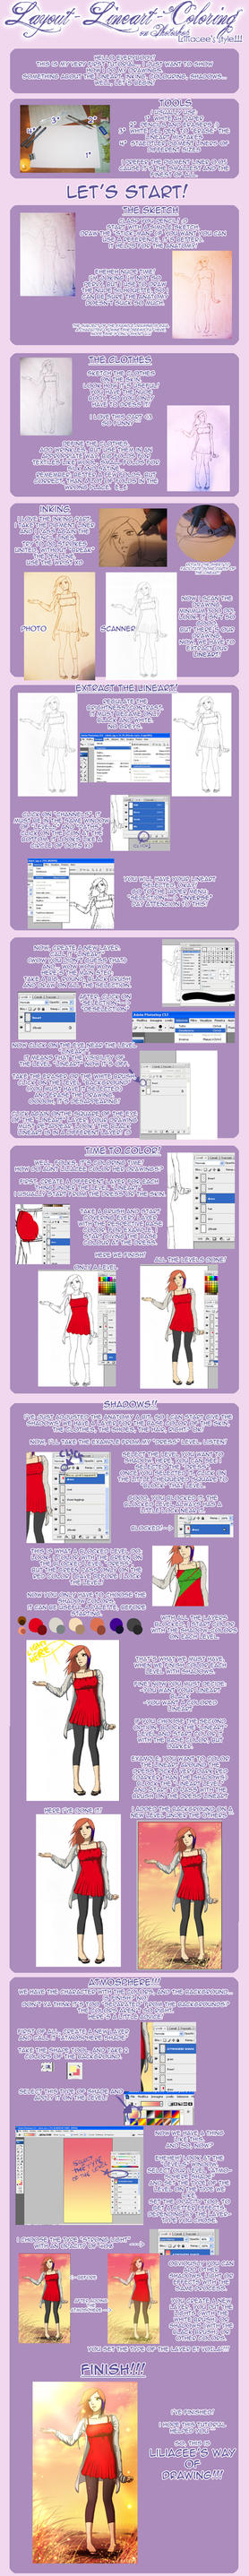 .:Lili's Photoshop TUTORIAL:. by liliacee